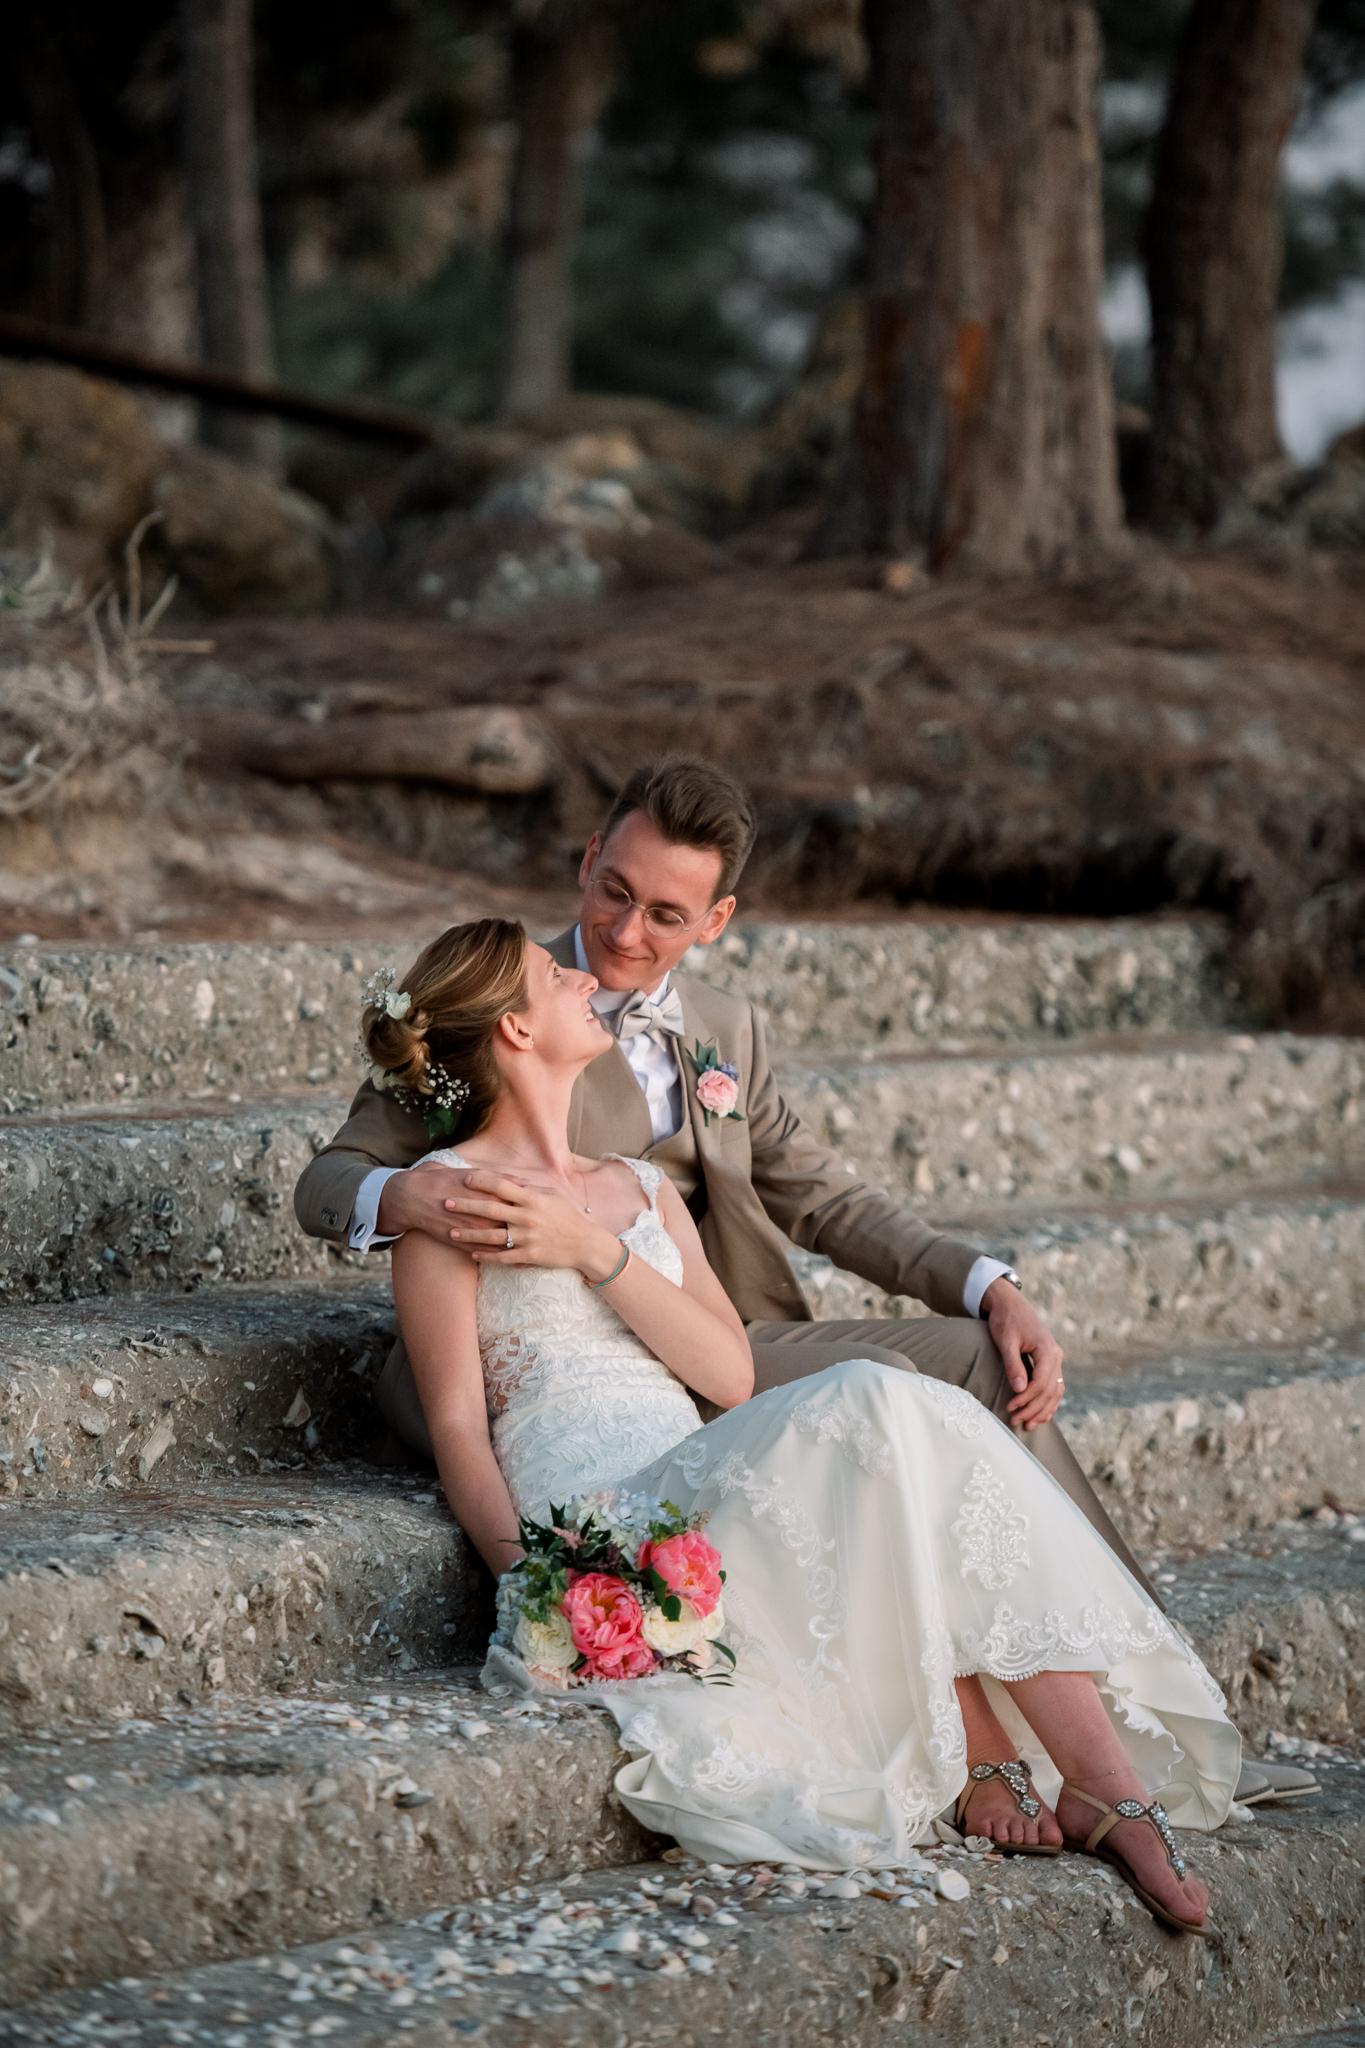 SARASOTA_WEDDING_PHOTOGRAPHY_SMMZ_8221.jpg